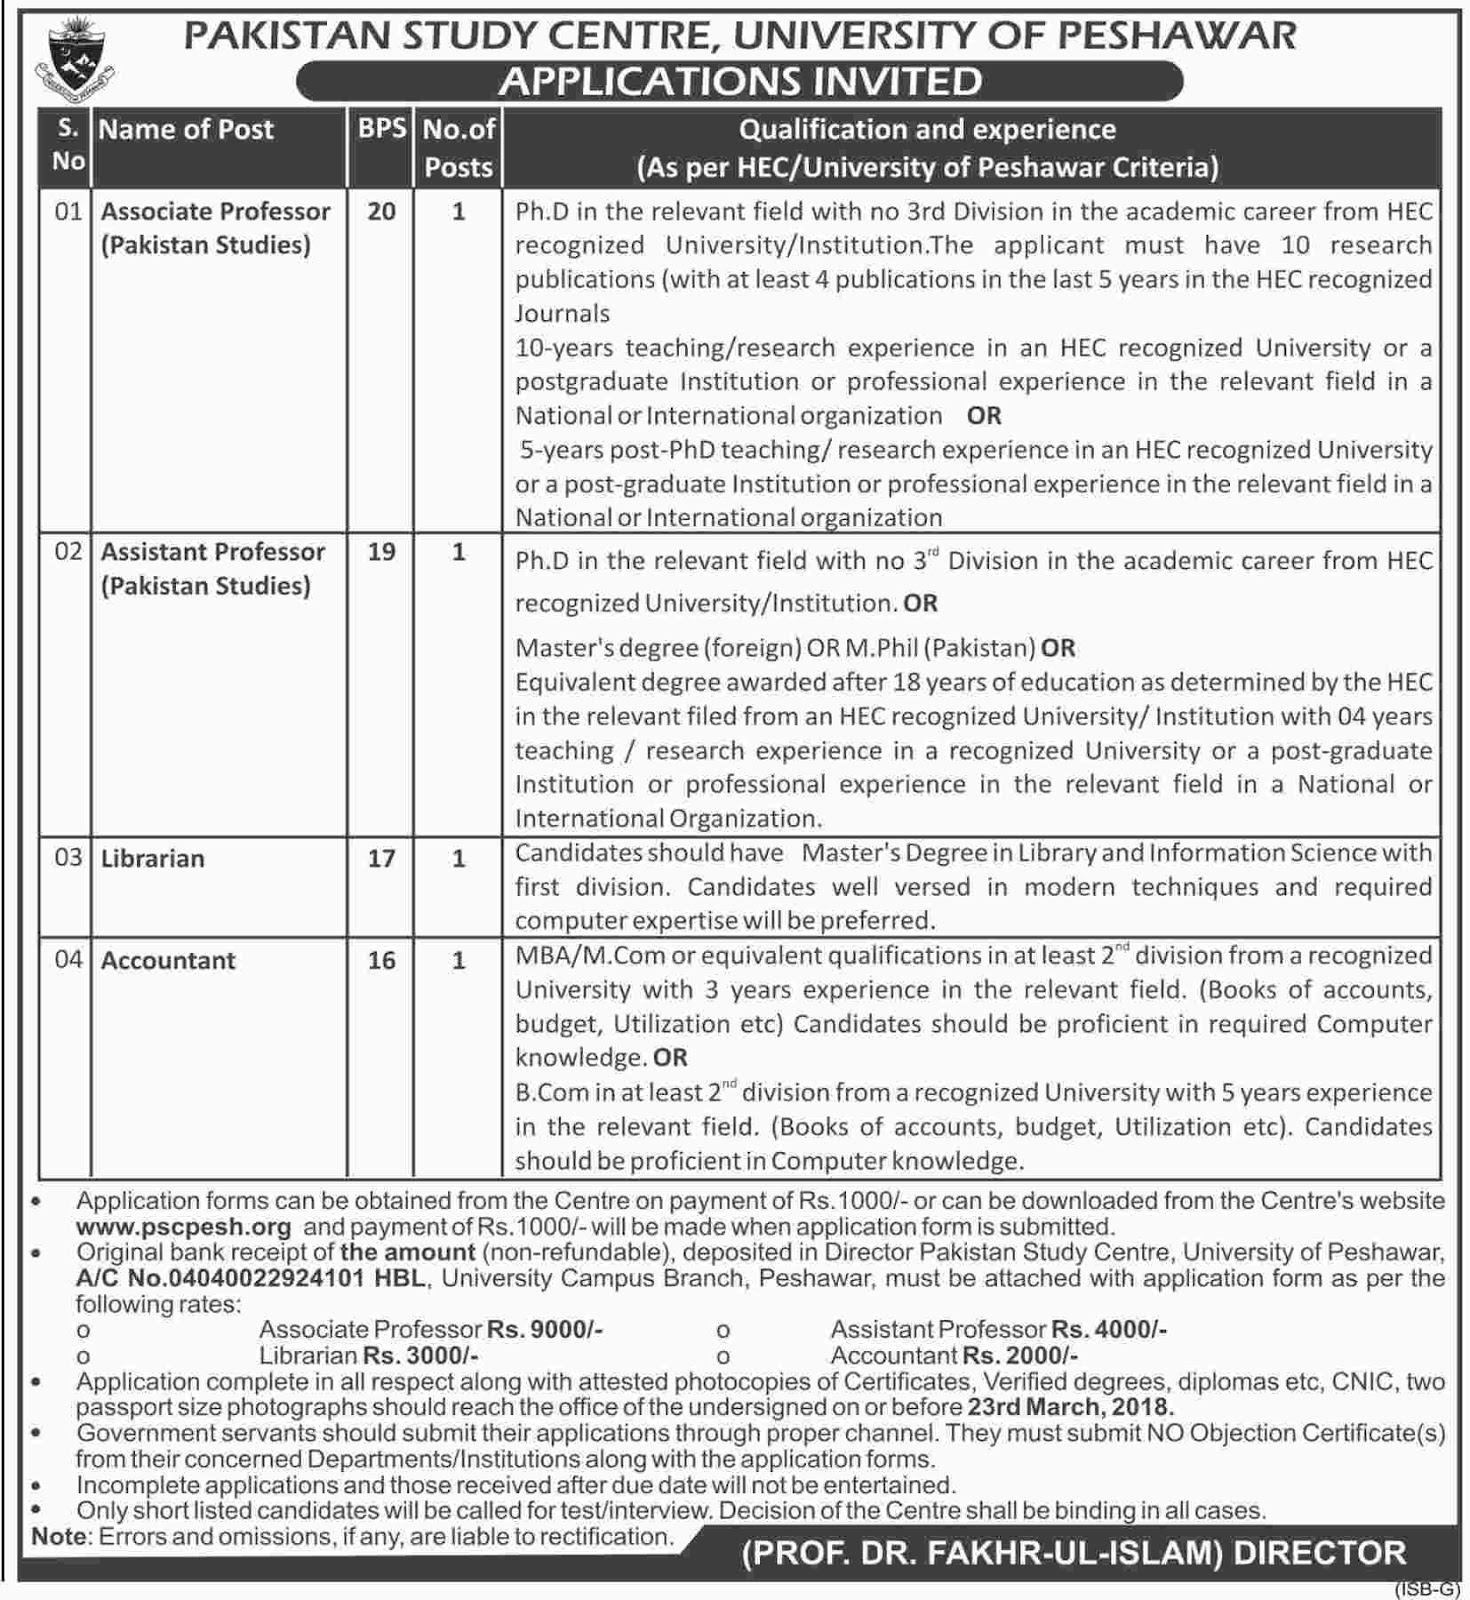 University of Peshawar for Professors, Librarian, Accountant